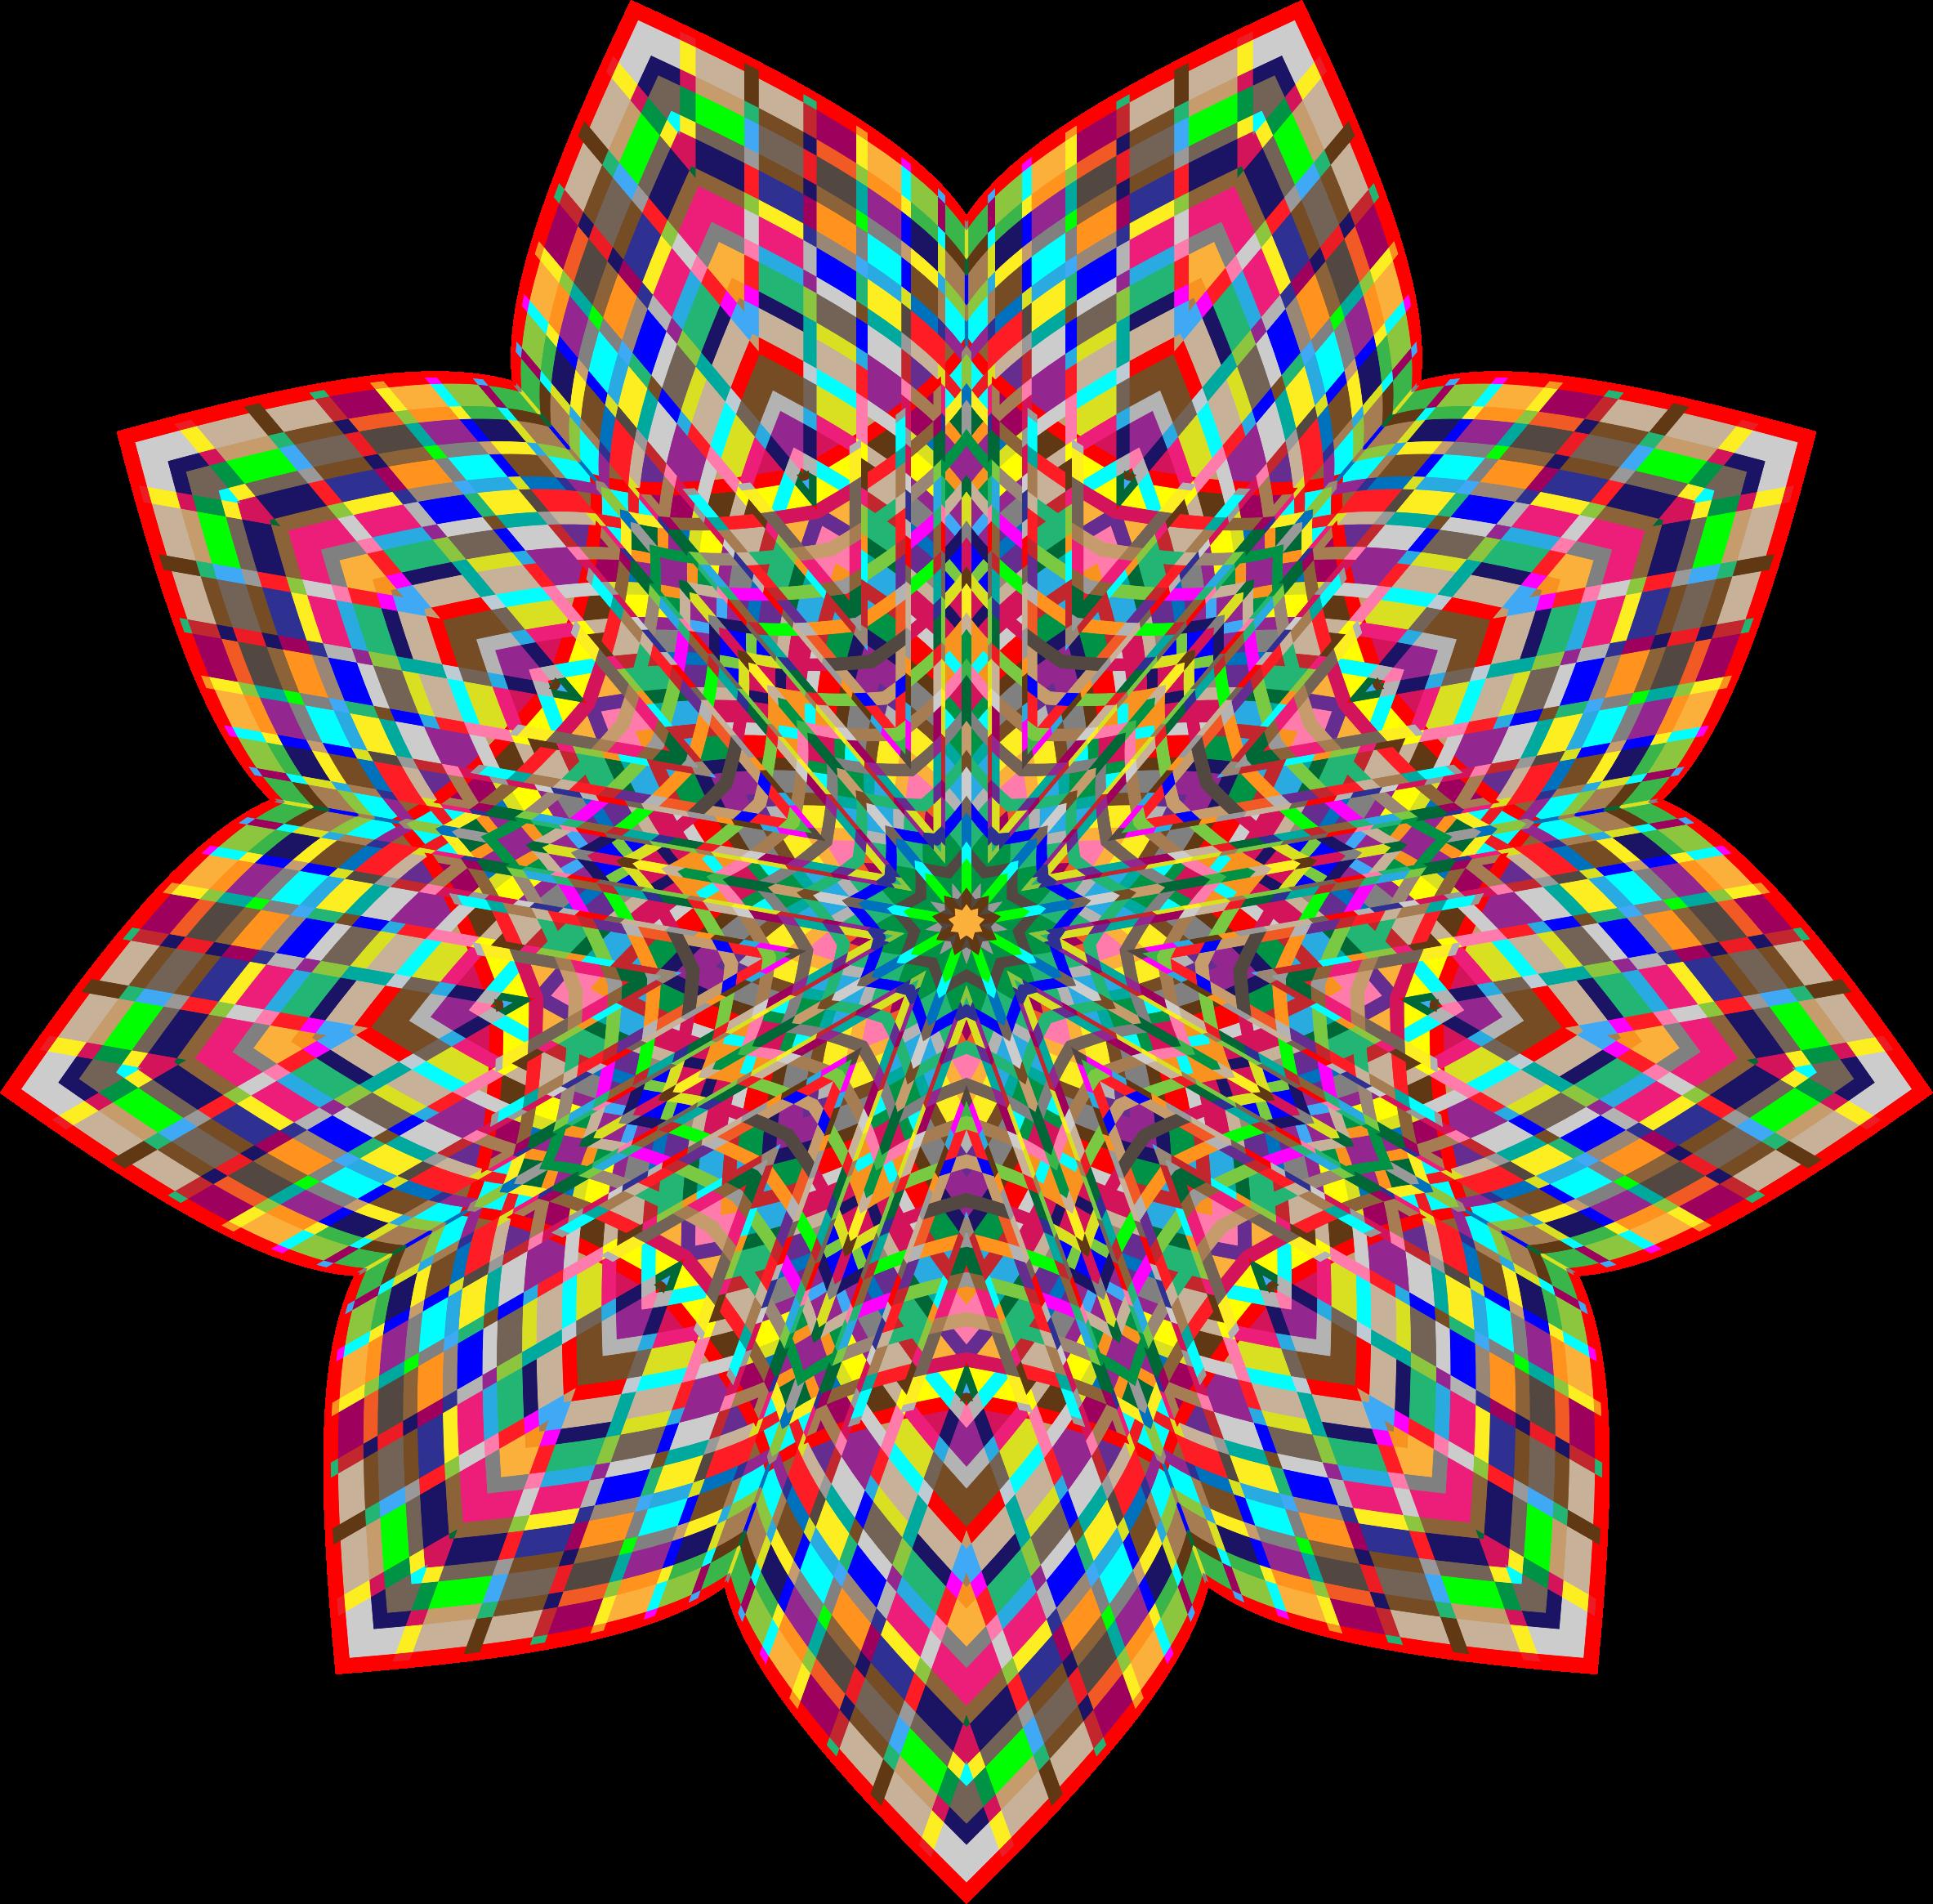 Crystal clipart abstract art. Tender loving meth big